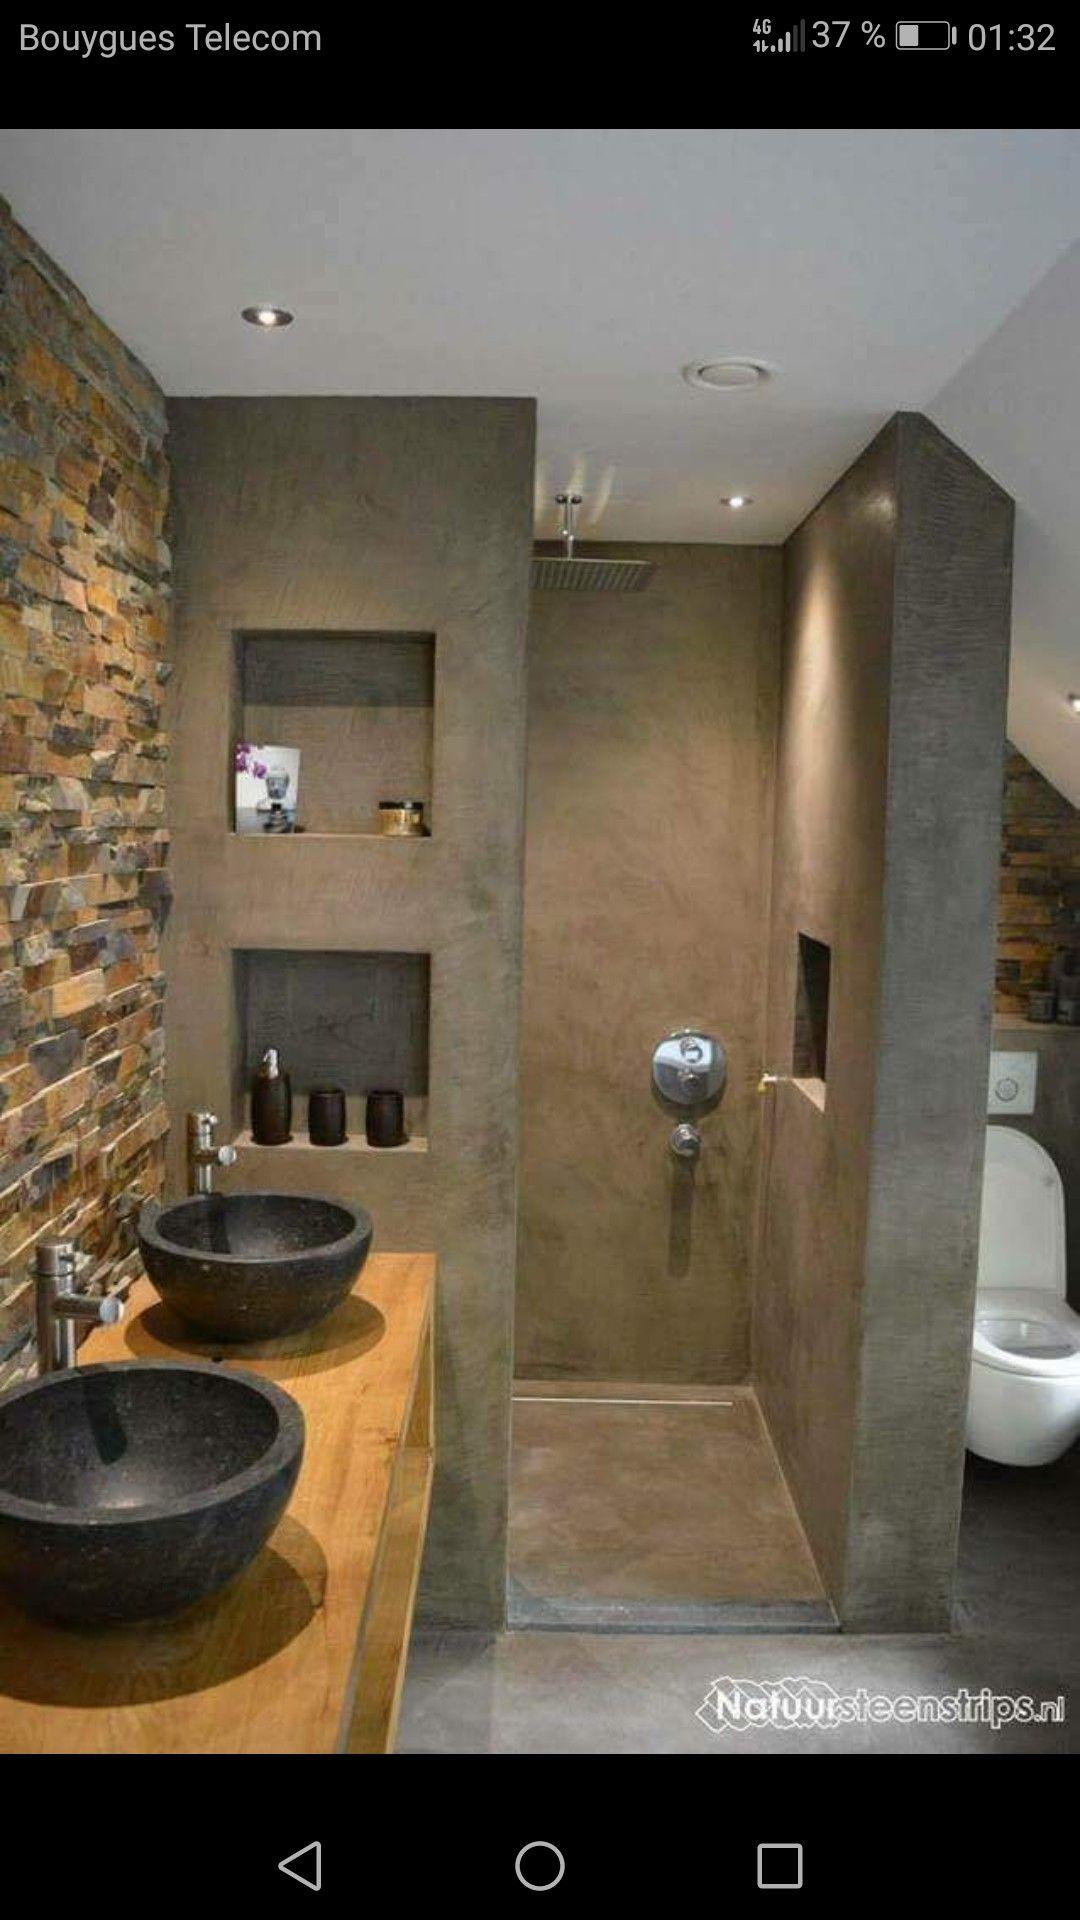 Out door bathroom idea  Houses  Pinterest  Badezimmer Baden und Bad